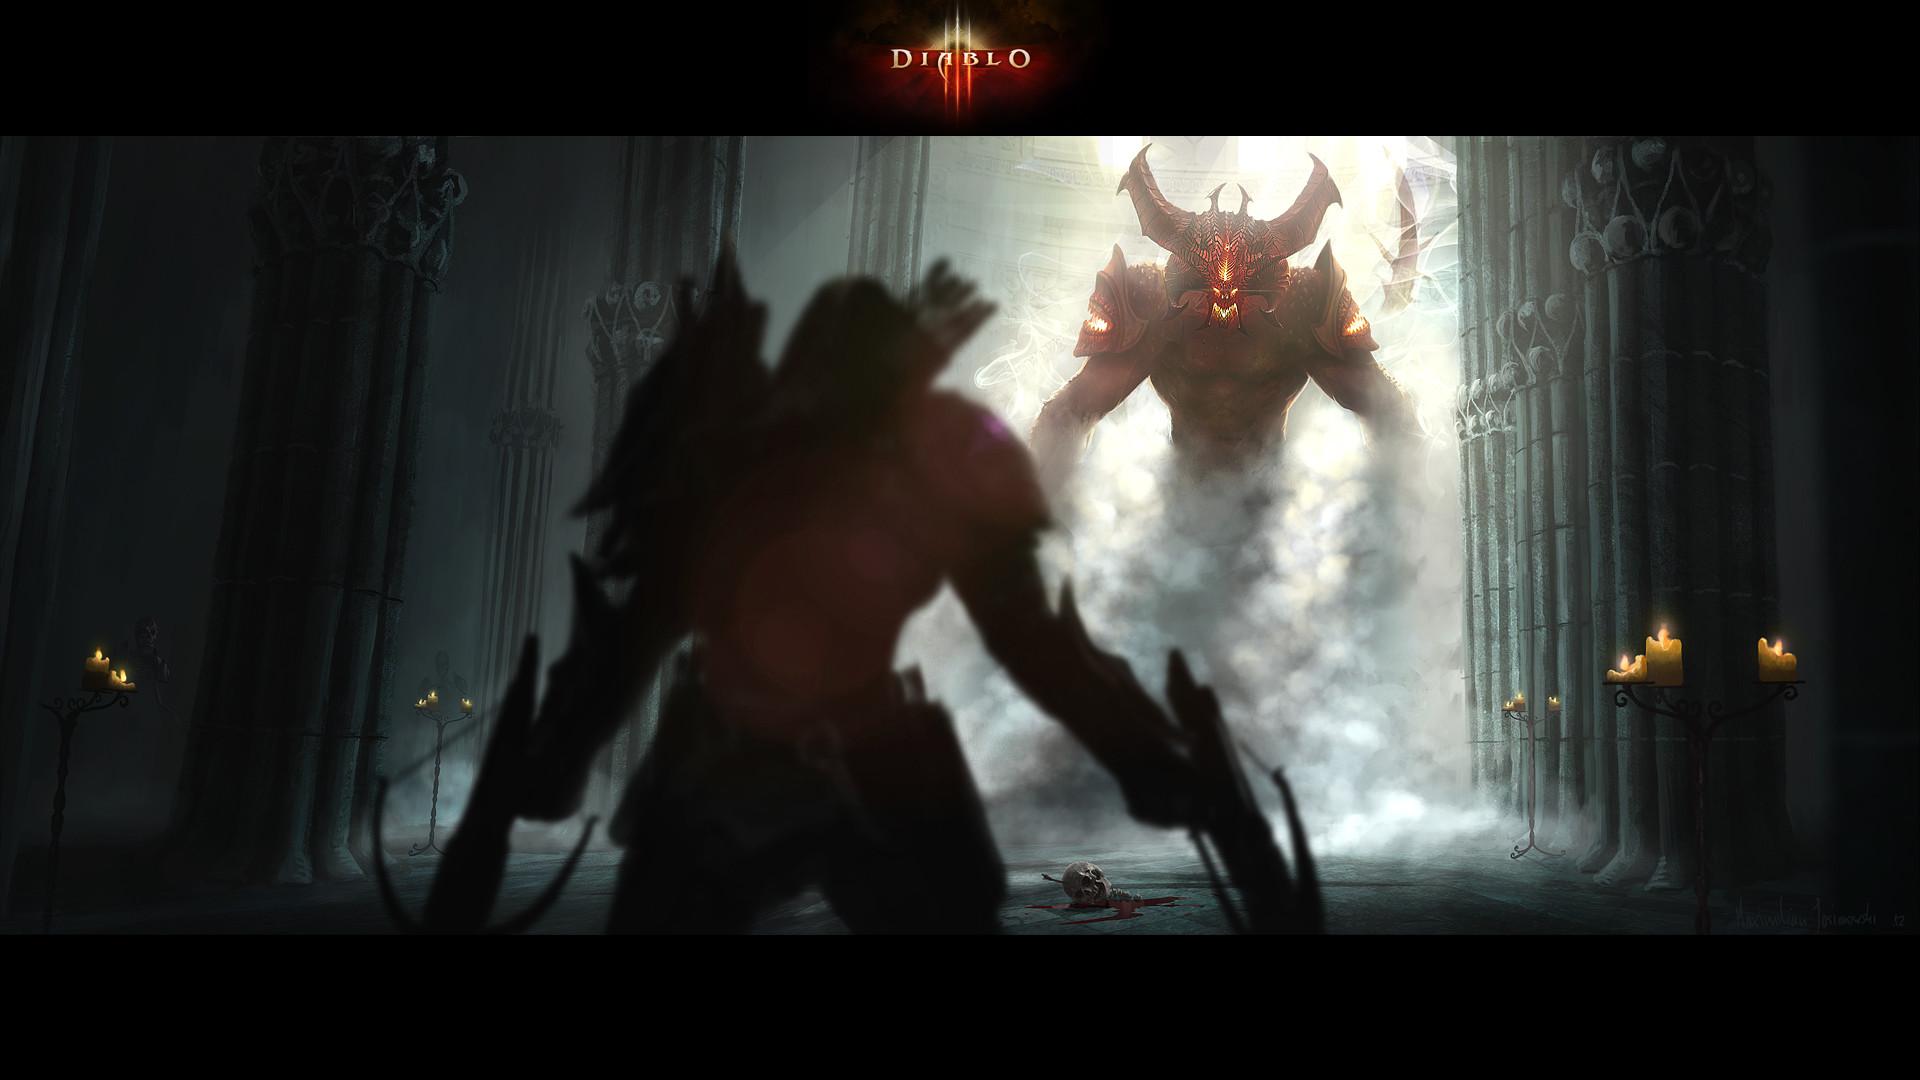 Diablo Rebirth #Awesome #cool #Diablo #Games #gaming #Rebirth #wallpaper